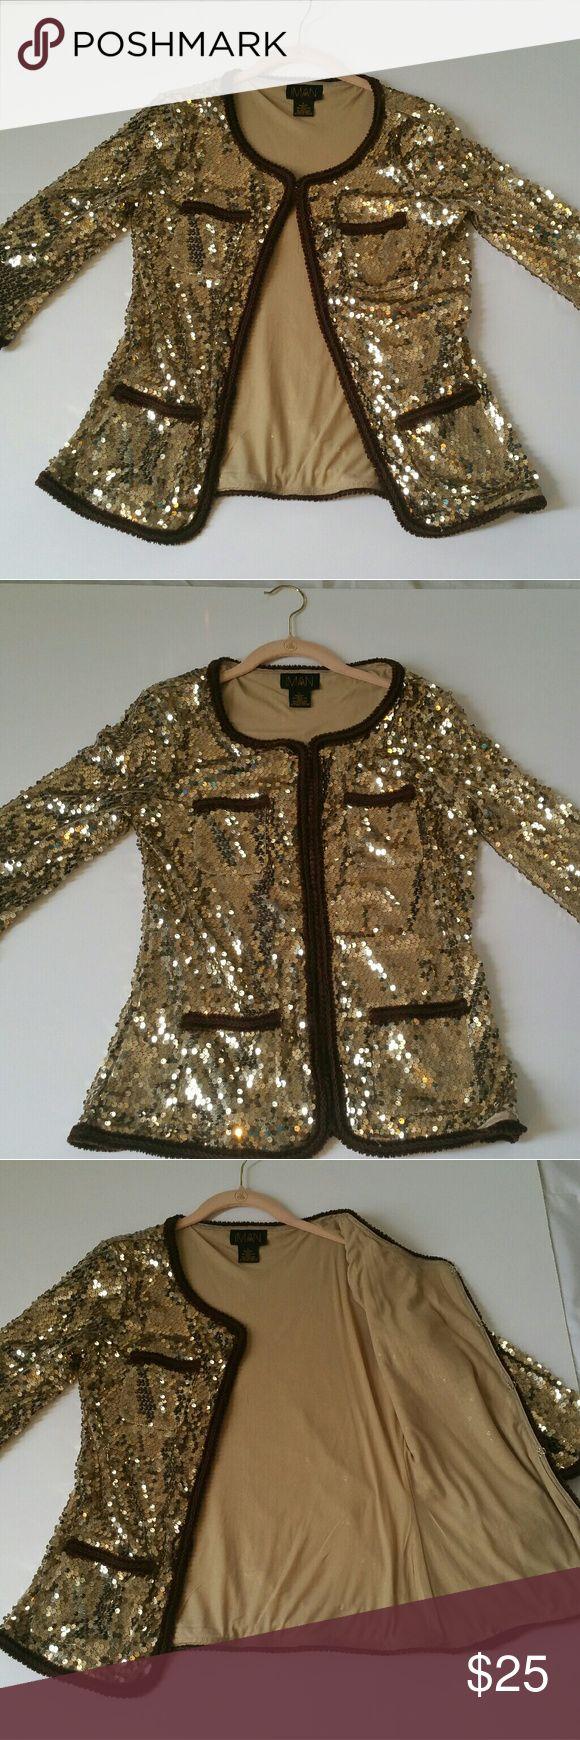 Iman Gold Sequin Jacket/Blazer Size Small Iman Gold Sequin Jacket/Blazer Size Small Iman Jackets & Coats Blazers